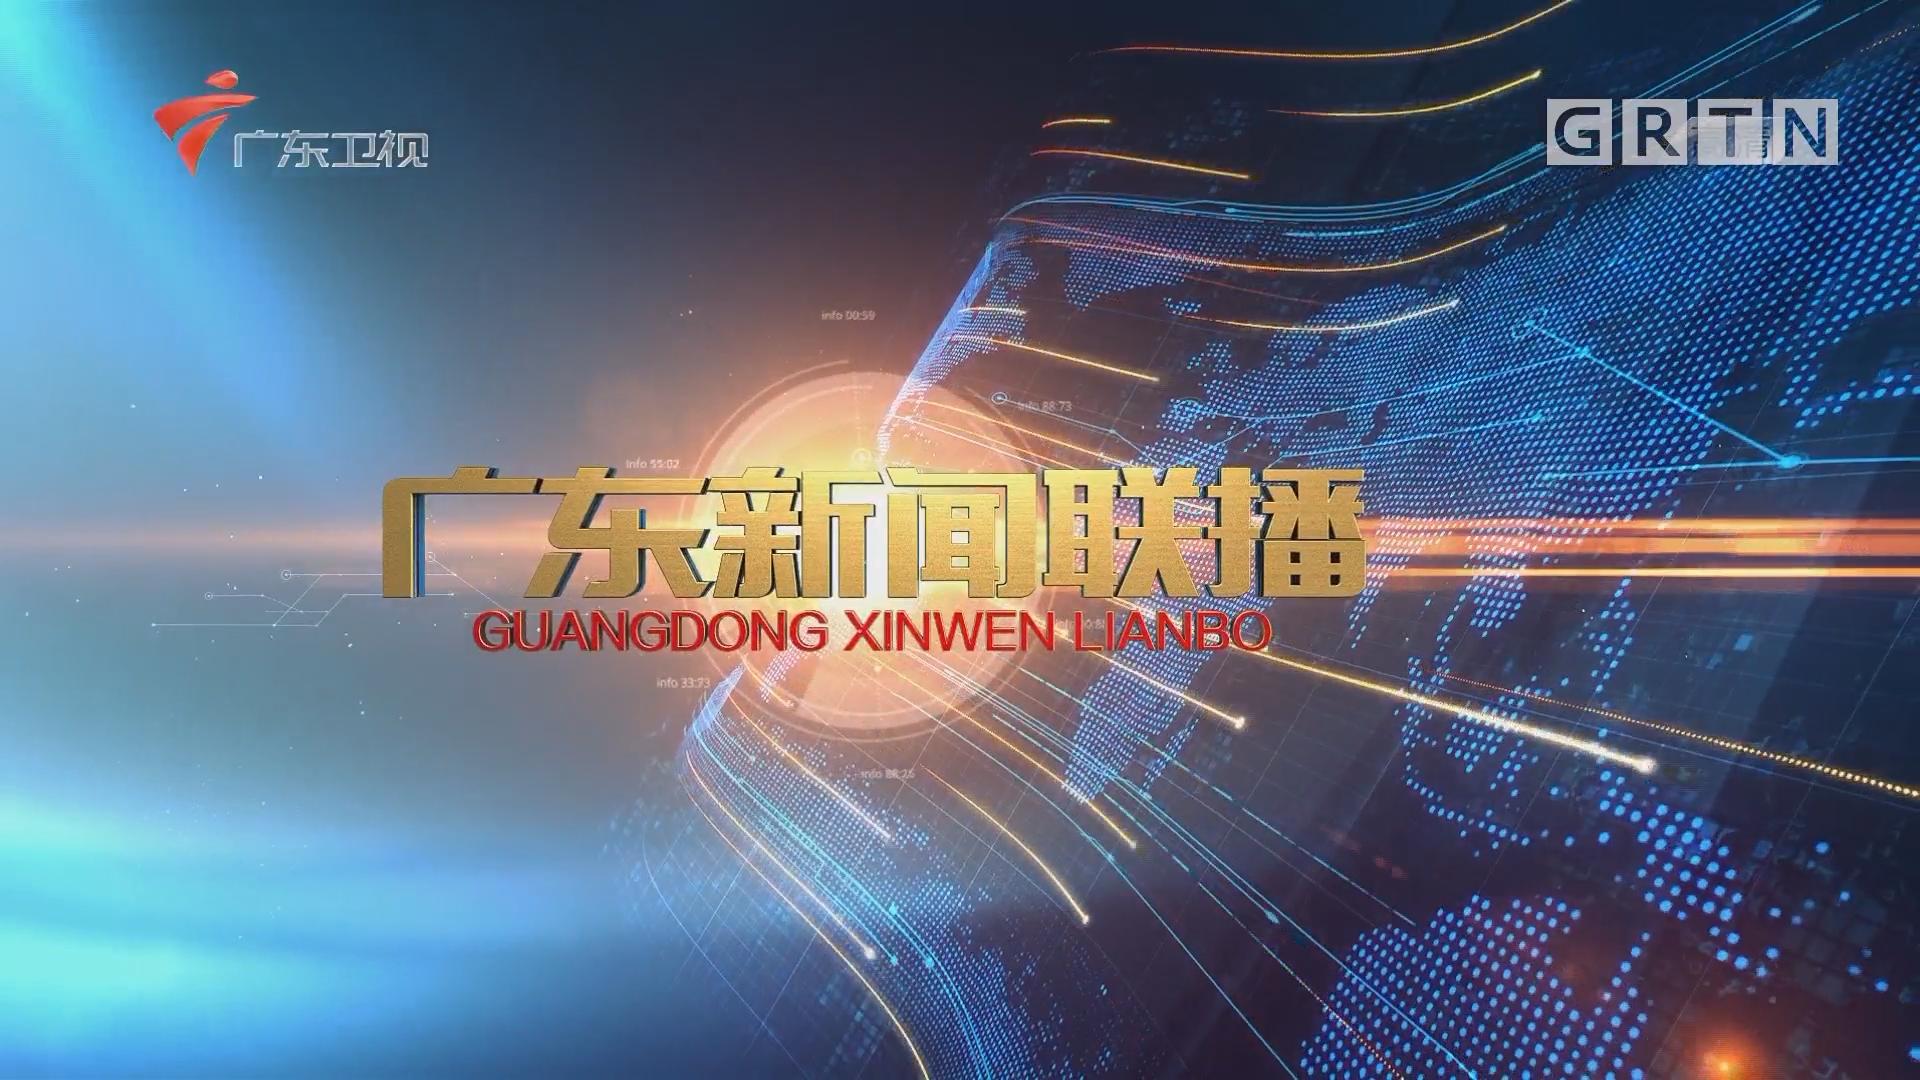 [HD][2018-10-26]广东新闻联播:习近平在广东考察时强调 高举新时代改革开放旗帜 把改革开放不断推向深入